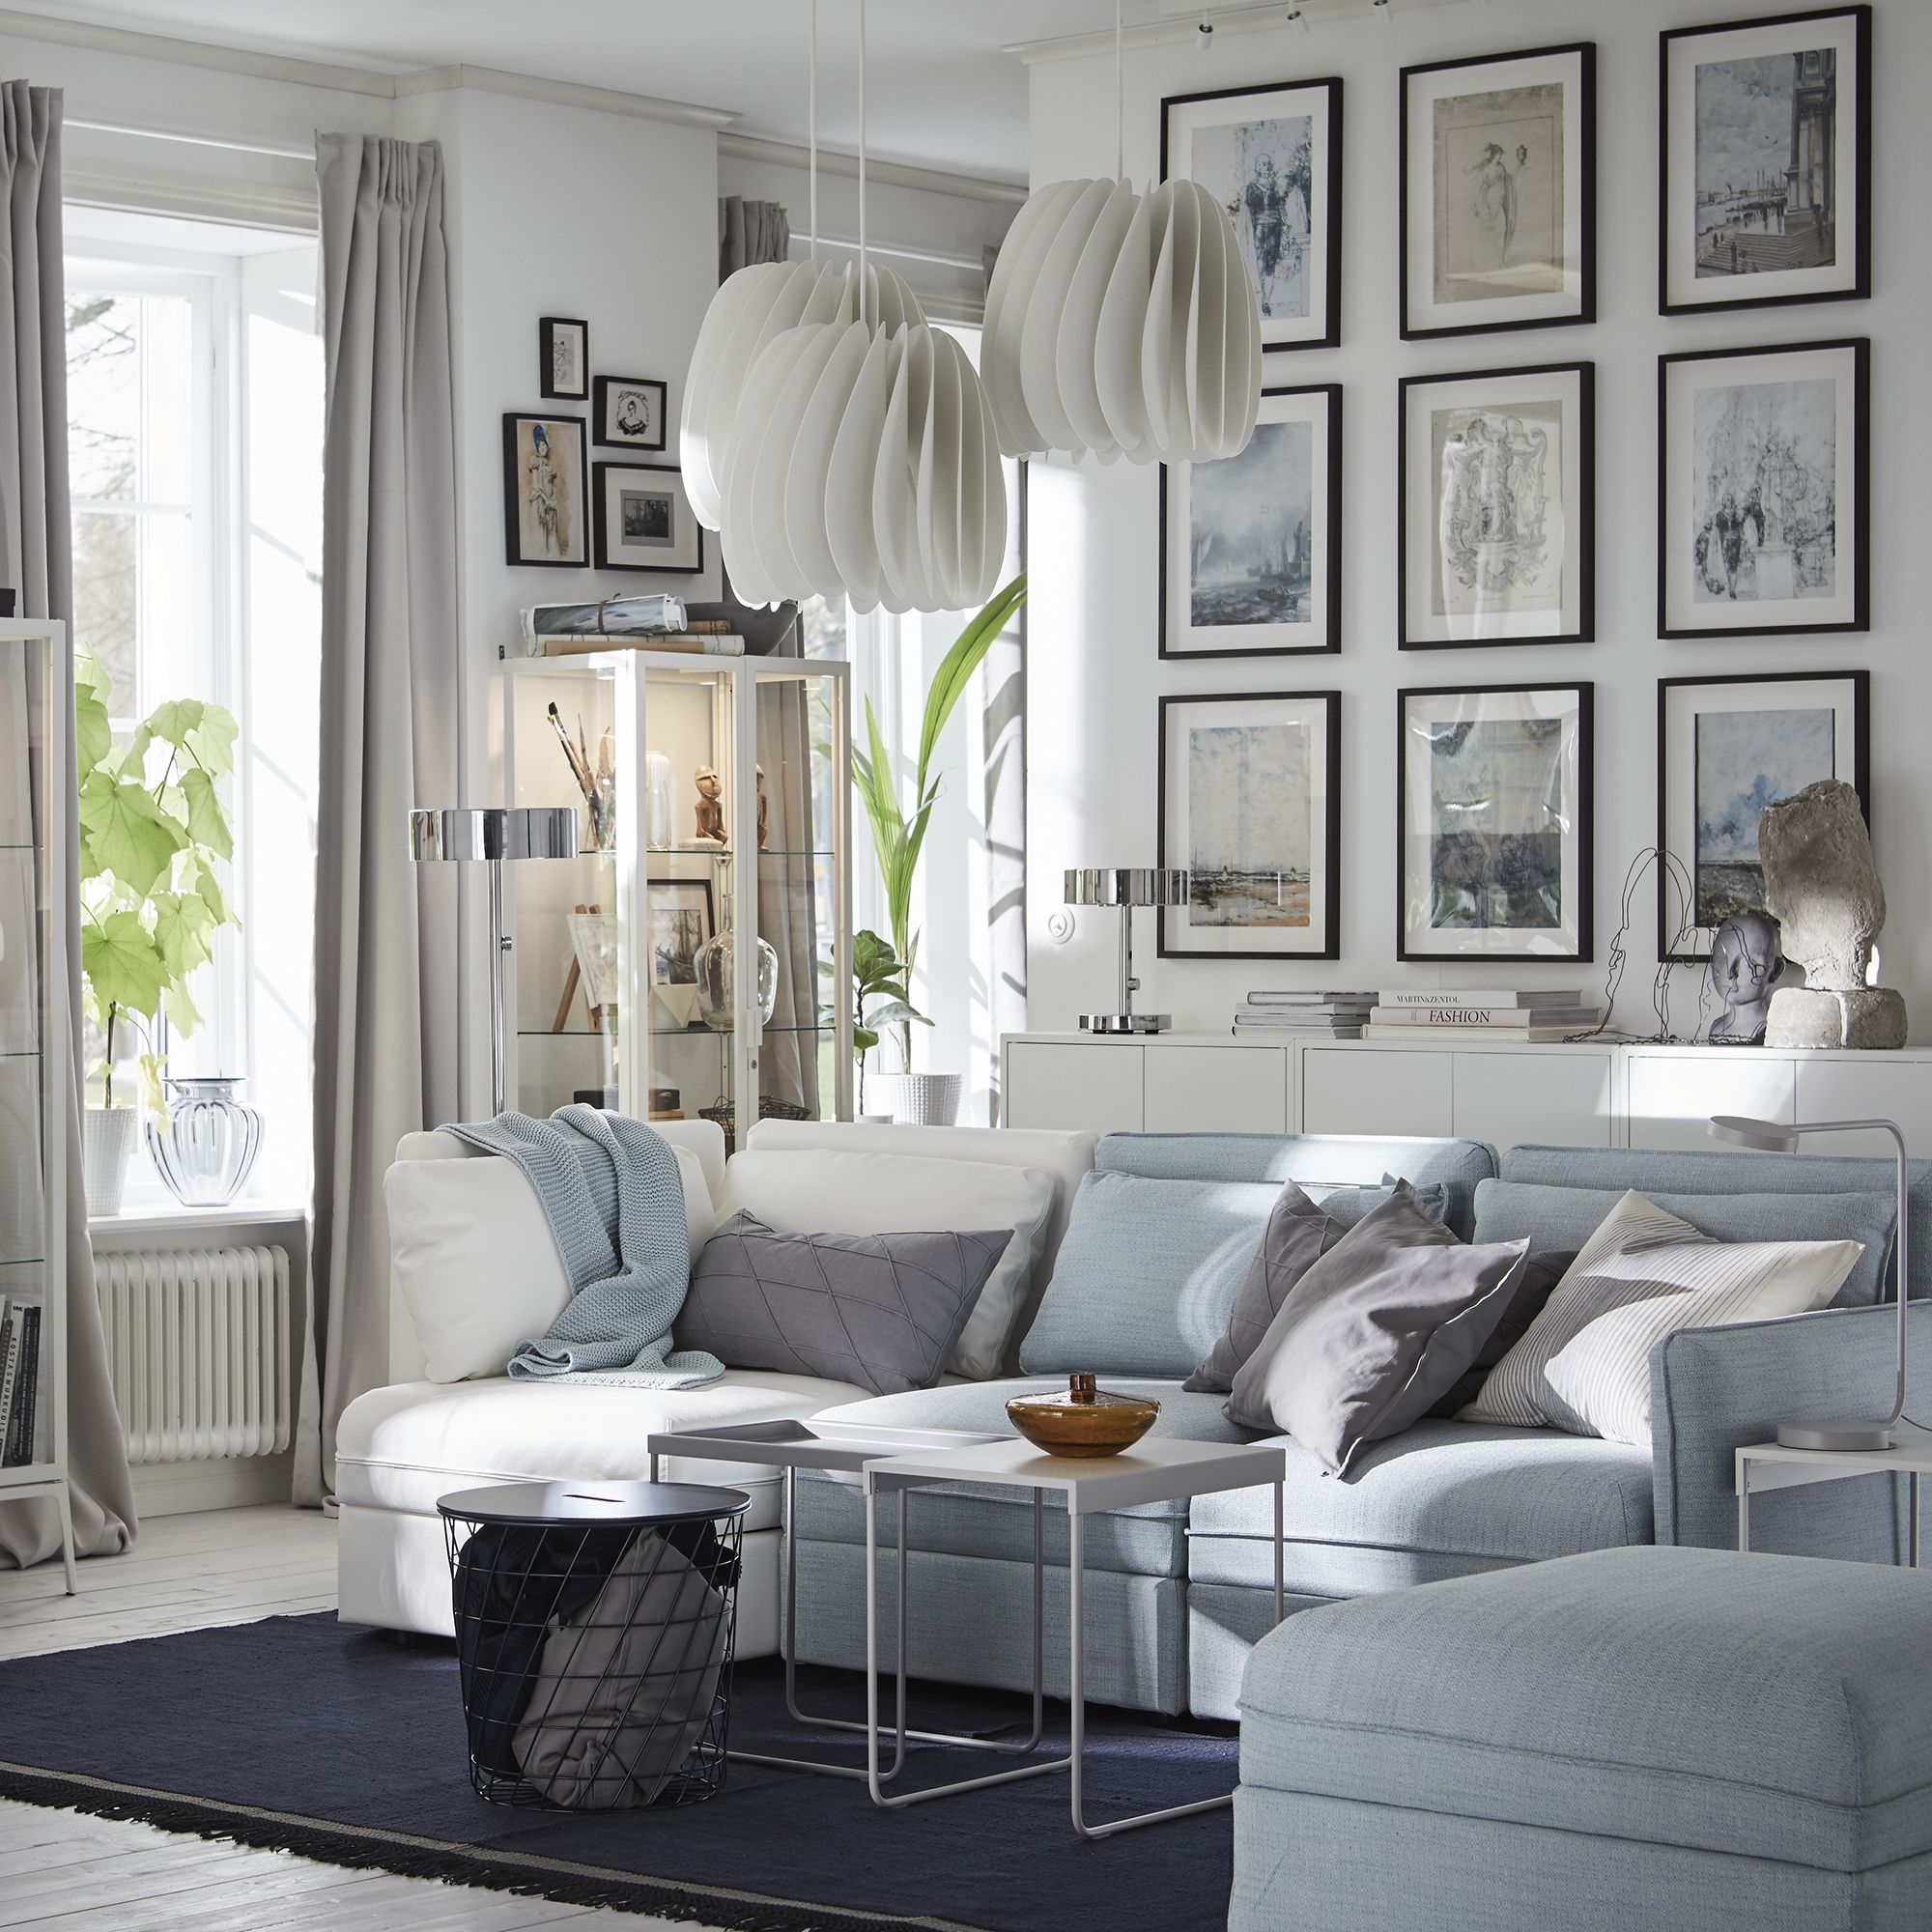 Ikea Living Room, Ikea Living Room Ideas